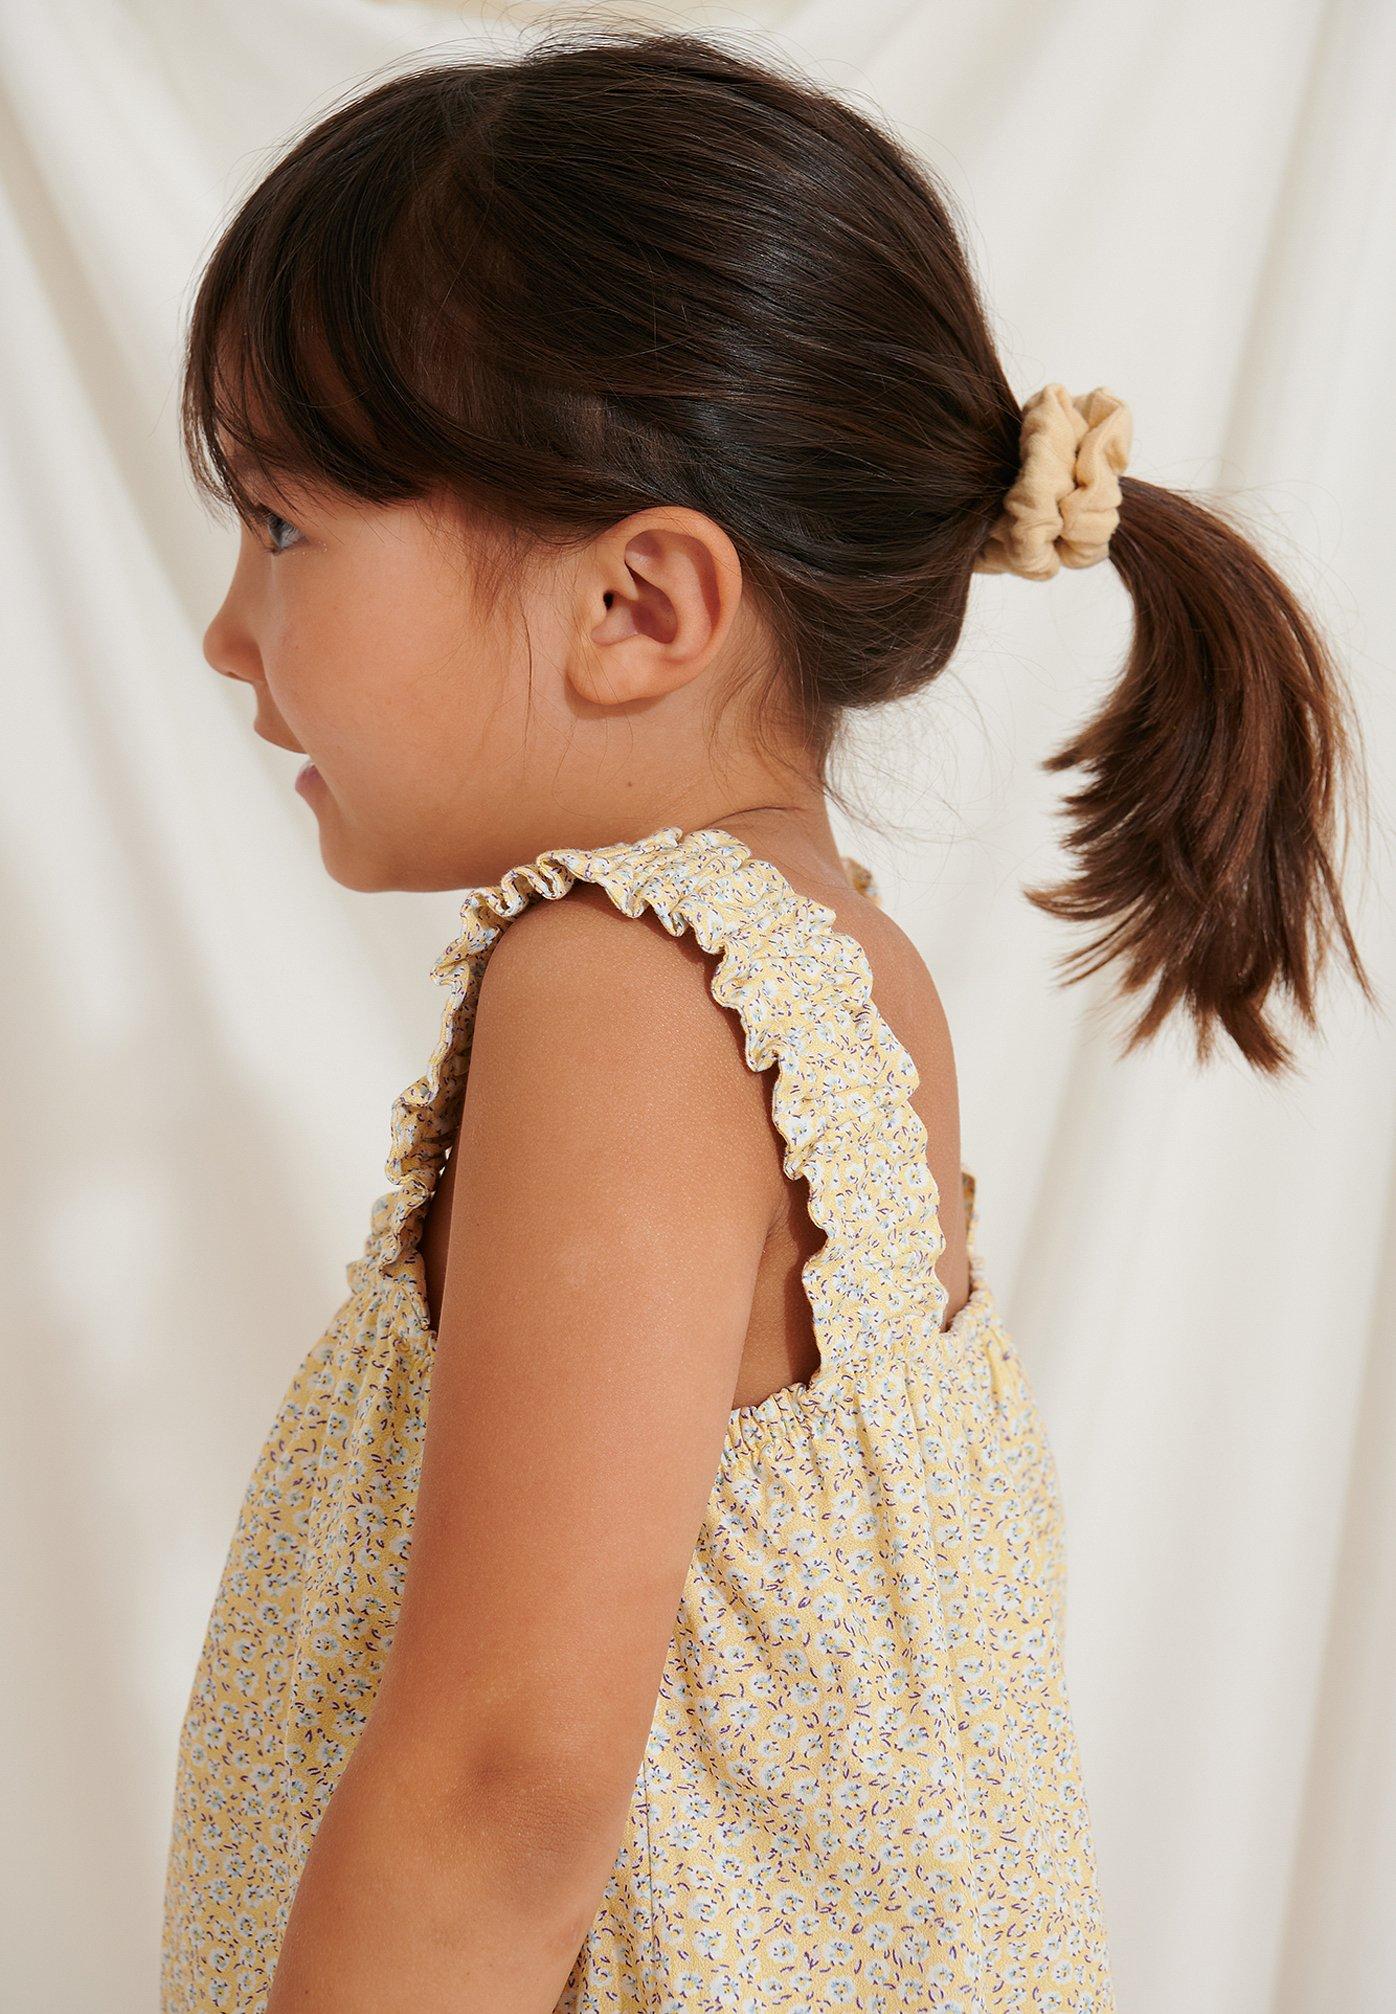 Kinder 2 PACK - Haar-Styling-Accessoires